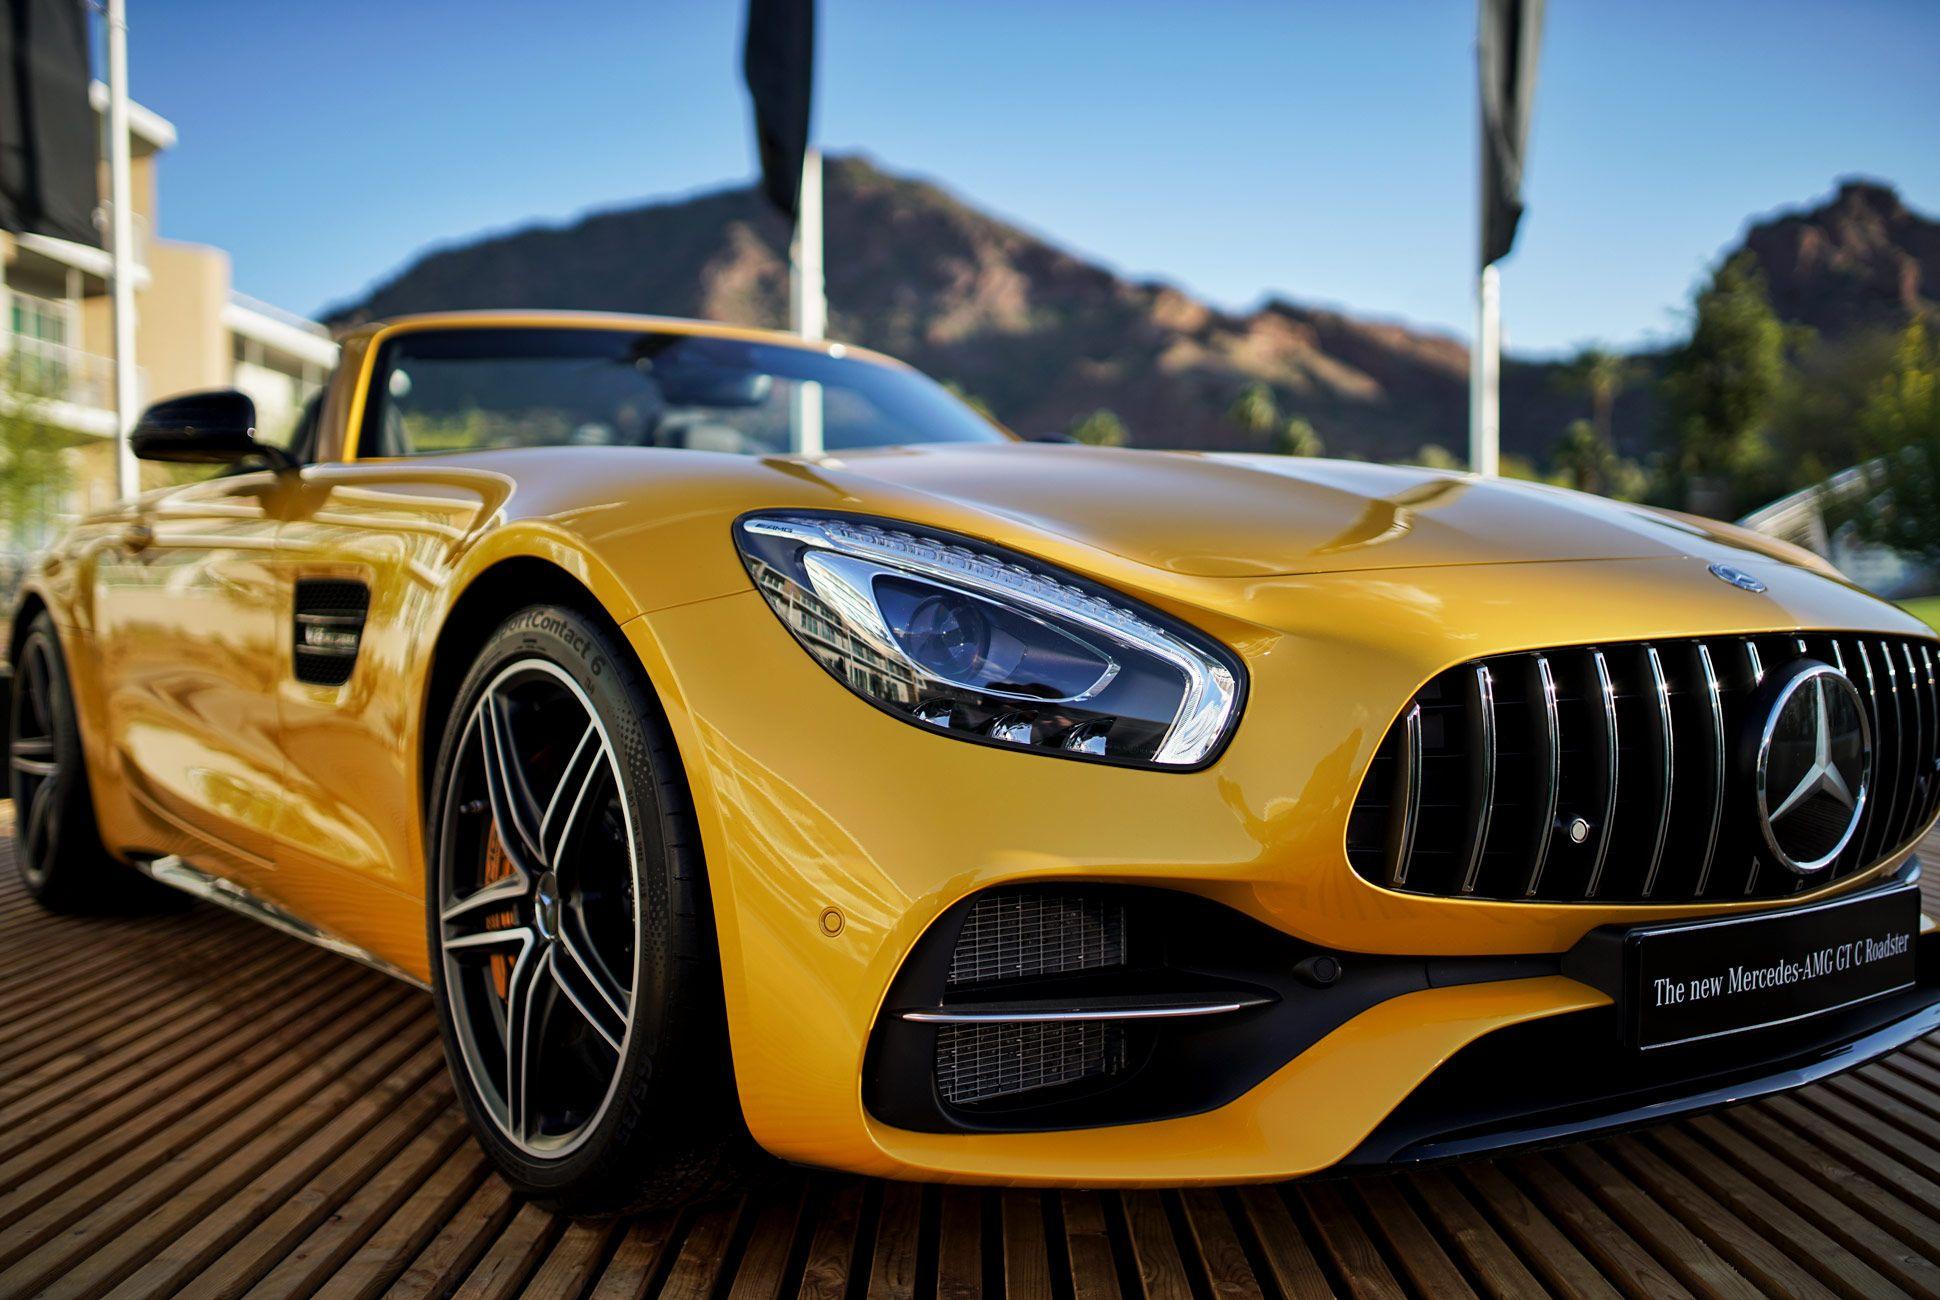 Mercedes-Benz-AMG-GT-C-Gear-Patrol-Slide-1